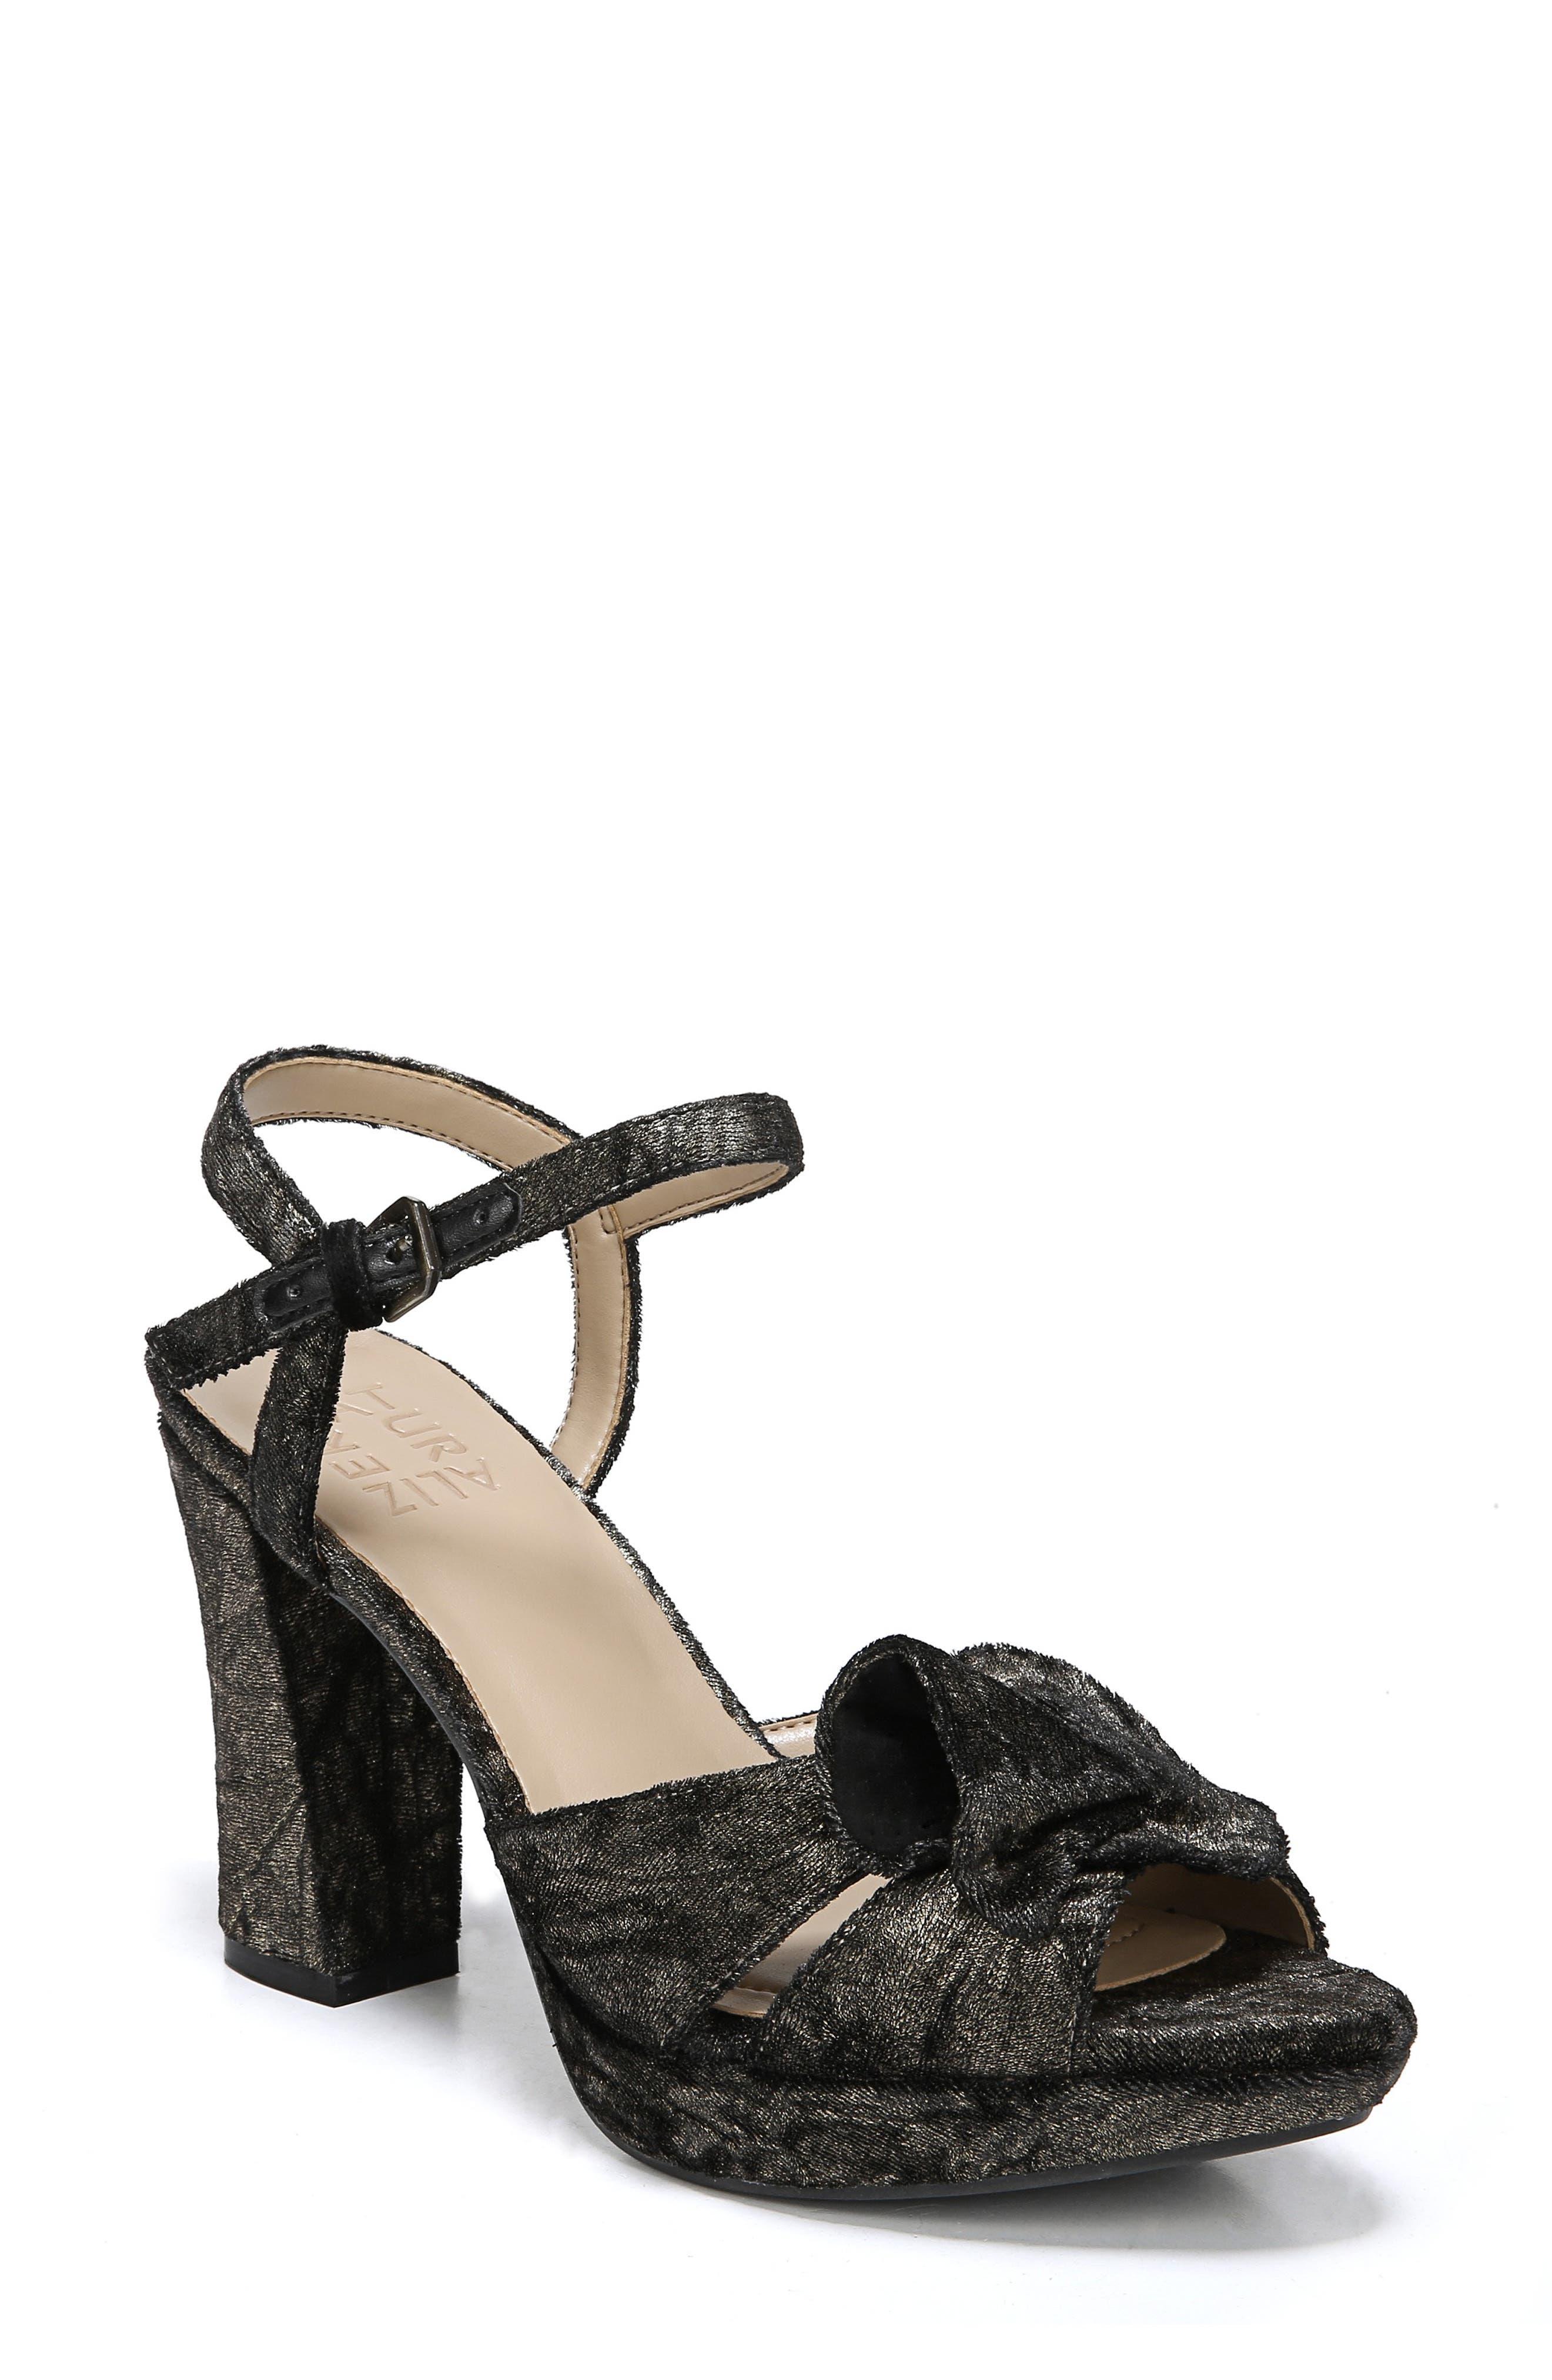 Naturalizer Adelle Sandal, Metallic